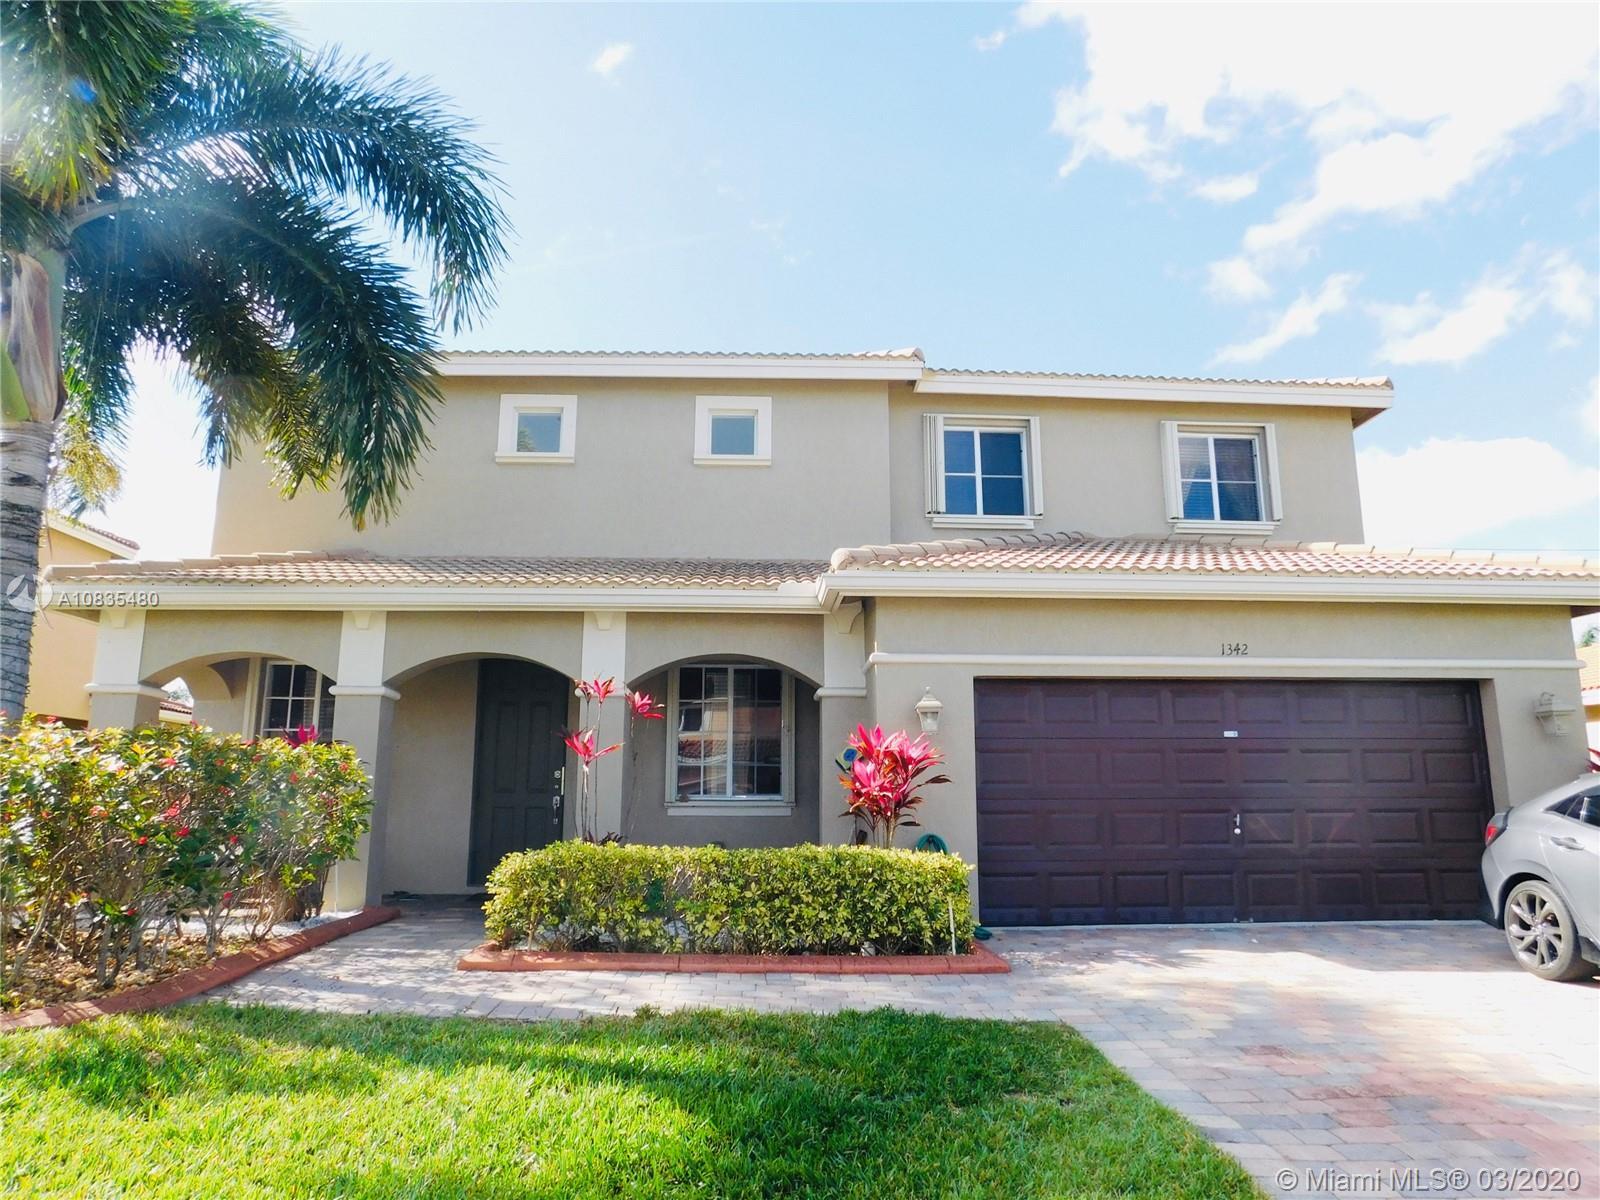 1342 NW 204th St, Miami Gardens, FL 33169